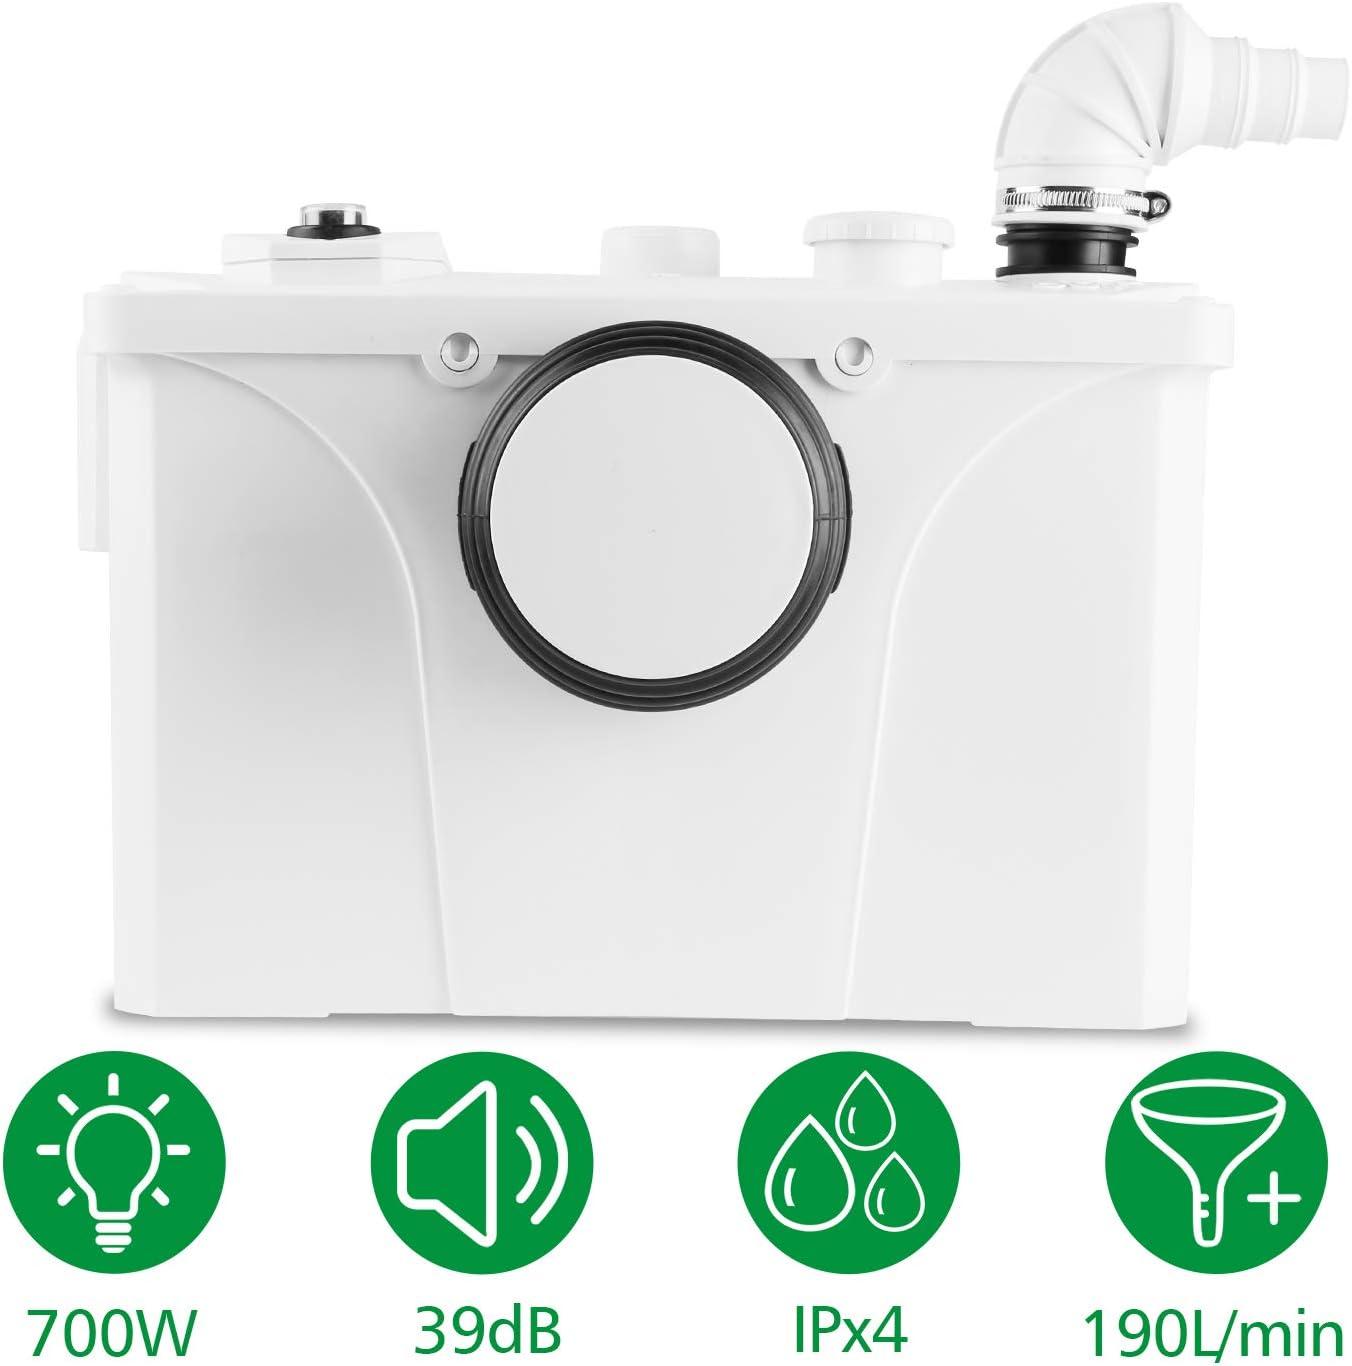 Hengda 4/1 Triturador Sistema De Elevación,700W 190L/min Bomba De Agua De Aguas Residuales WC Bomba Doméstica De Elevación De Aguas Residuales Inodoro